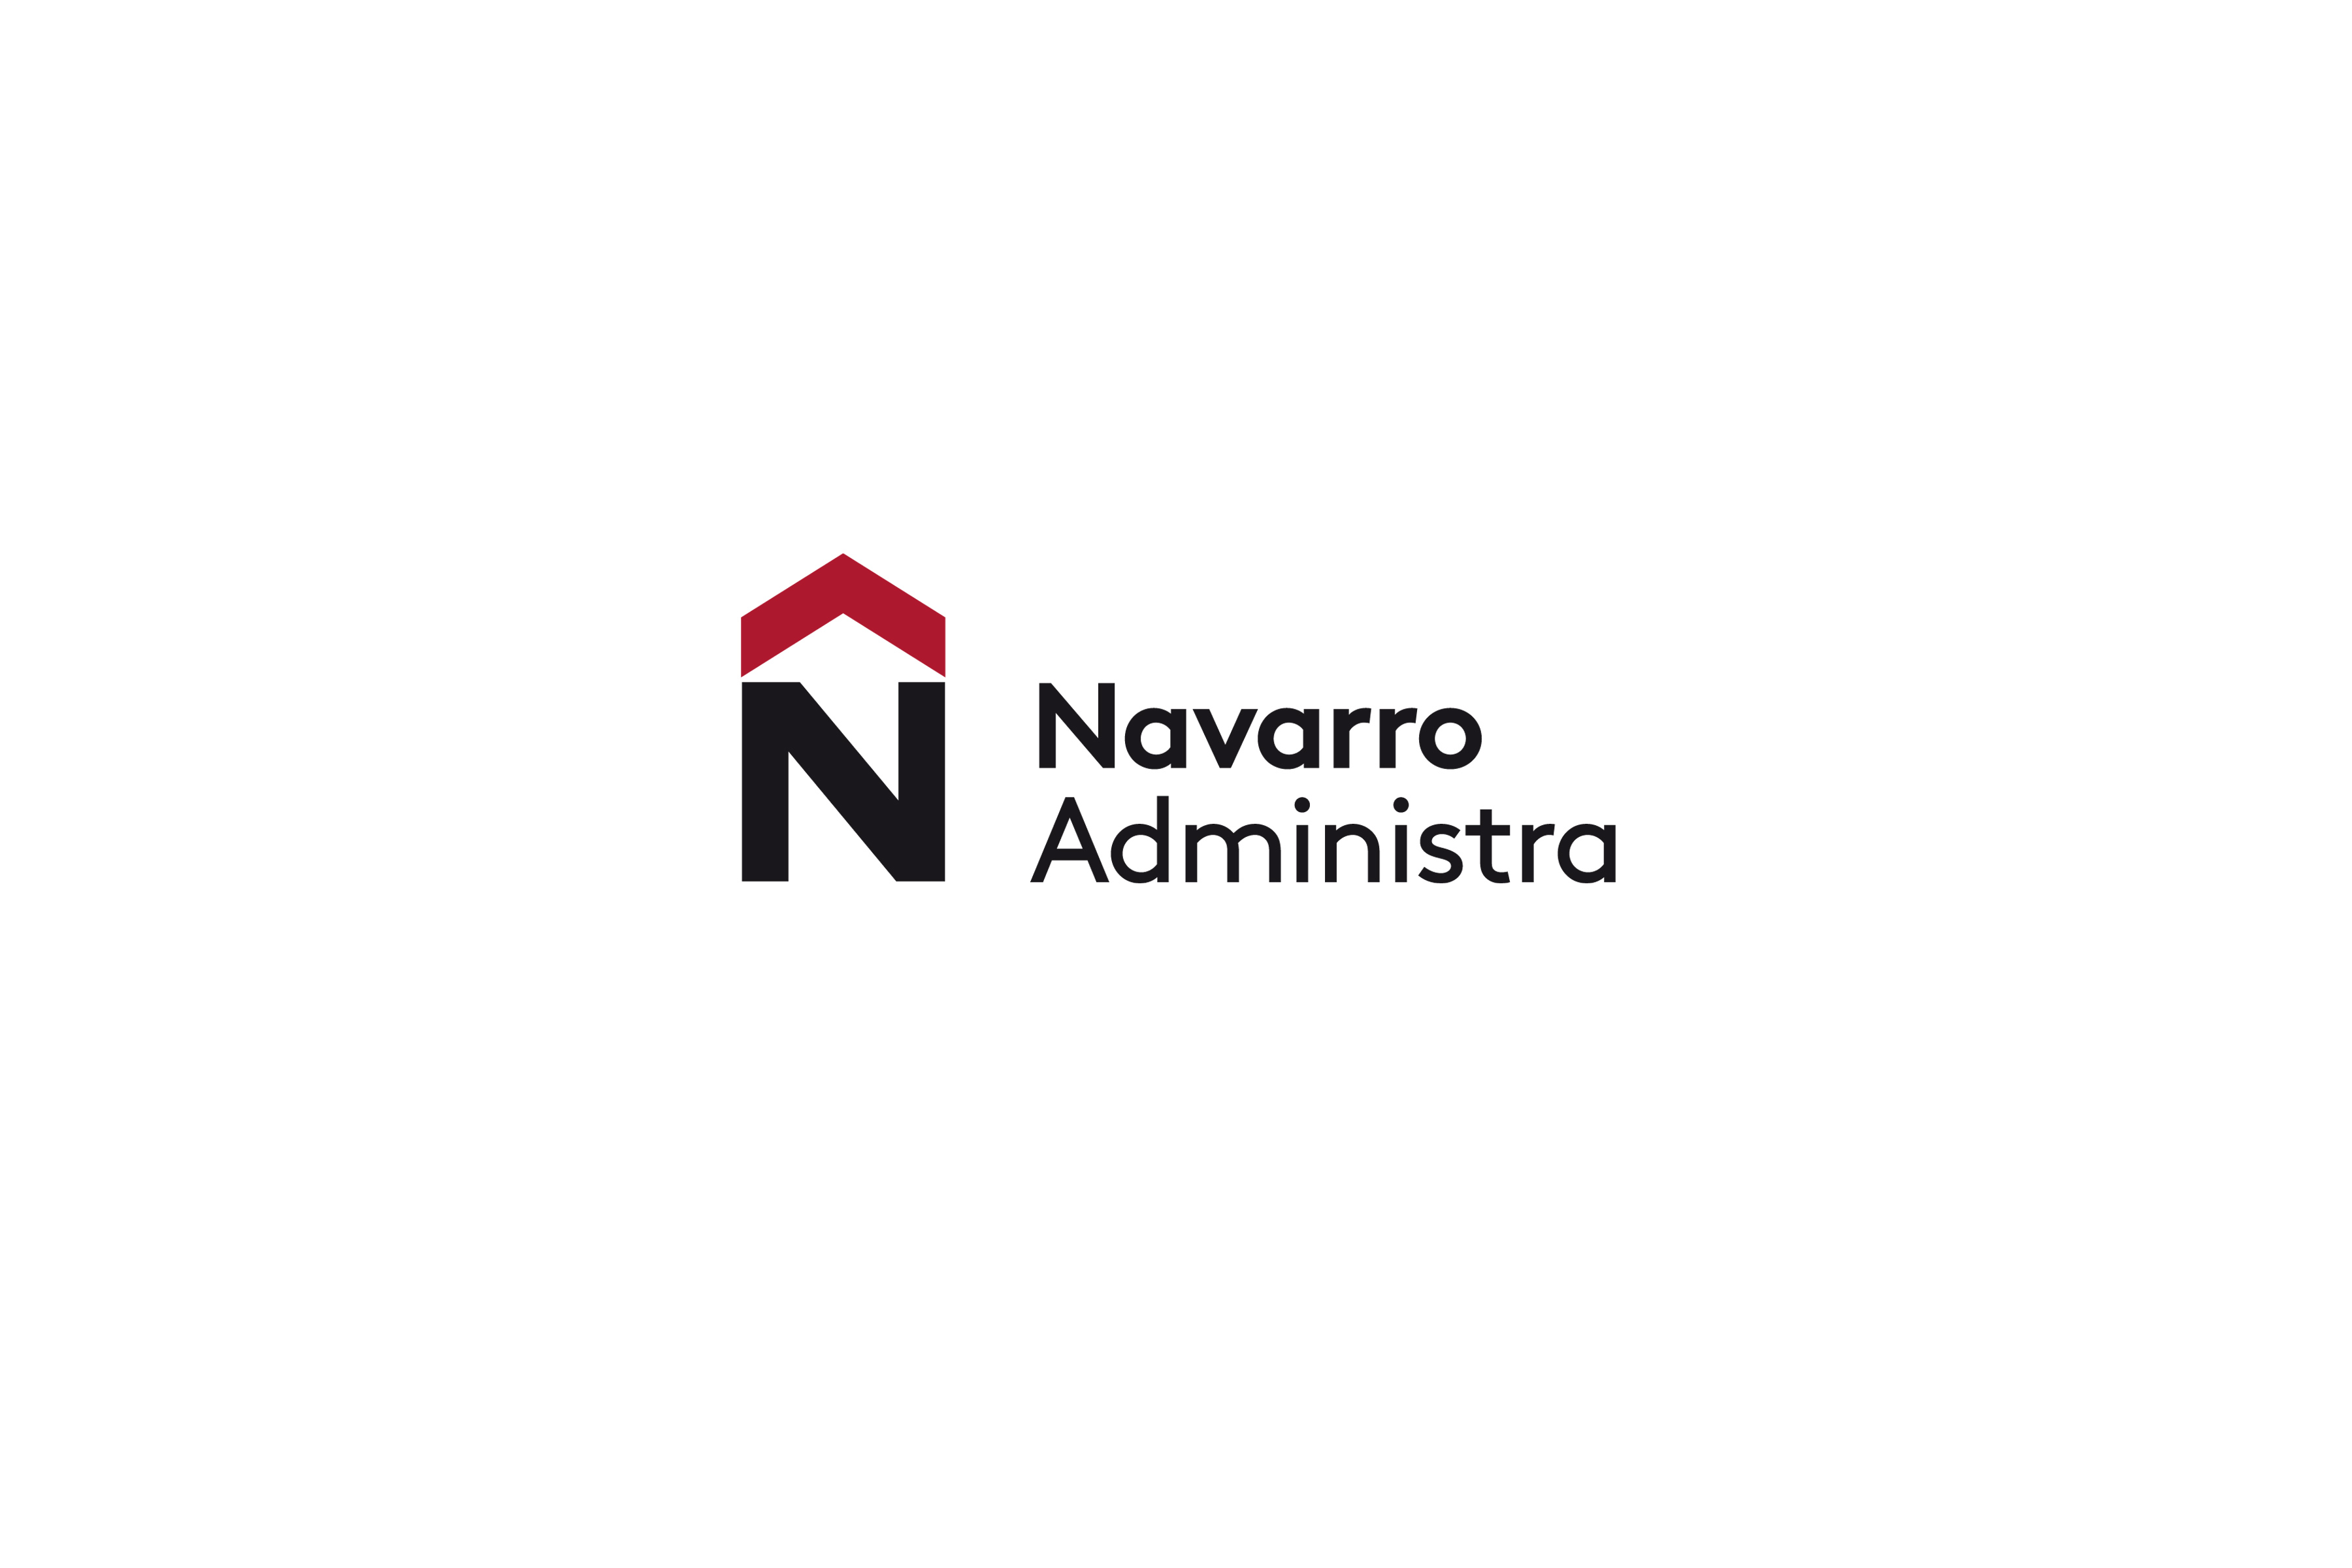 Navarro_marca.jpg